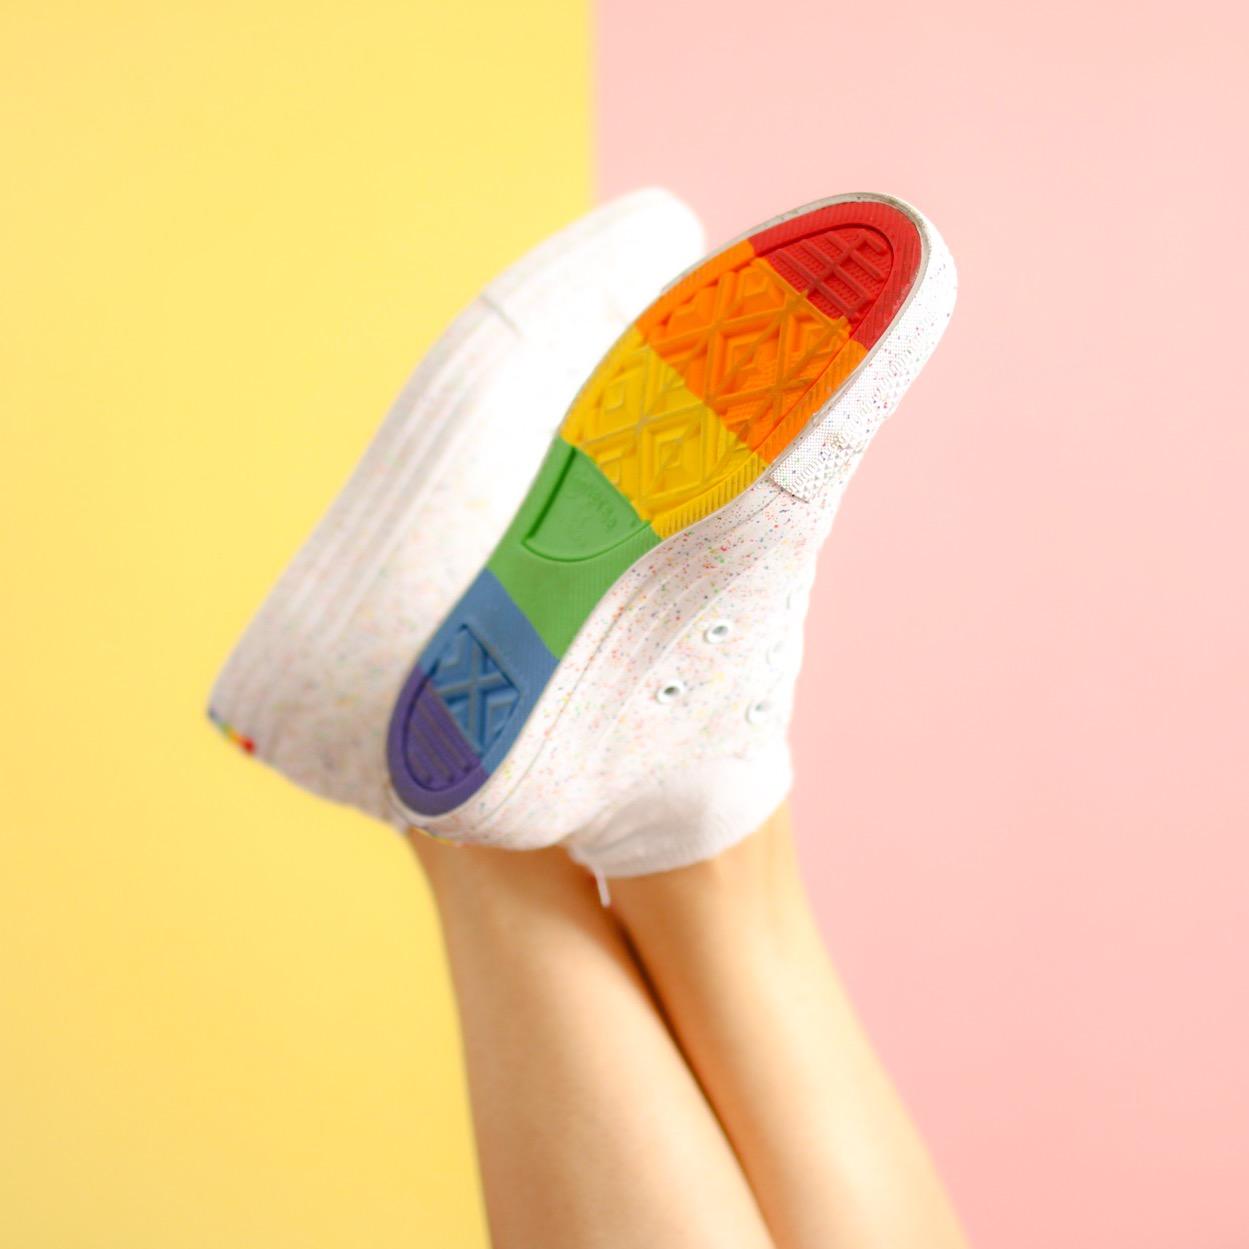 converse rainbow I Sp4nkblog